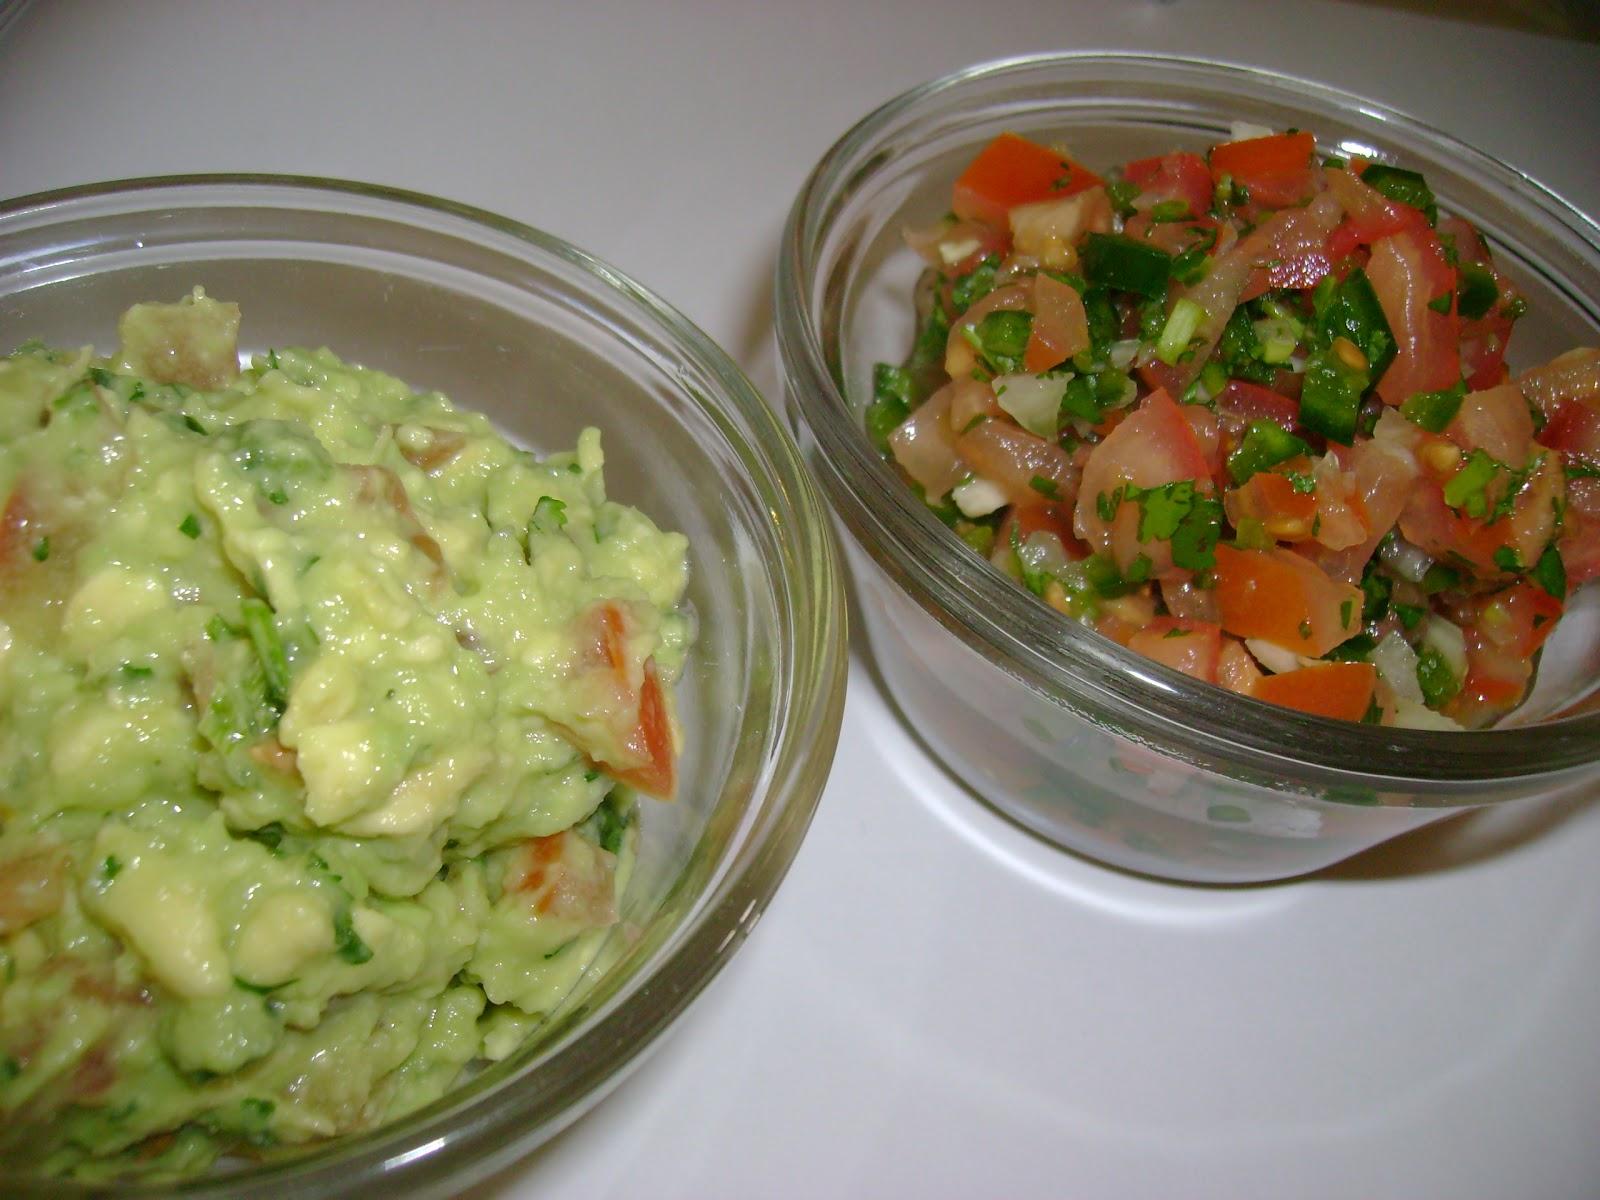 ... Chillies - Recipes. Reviews. Giveaways.: Guacamole and Pico de Gallo